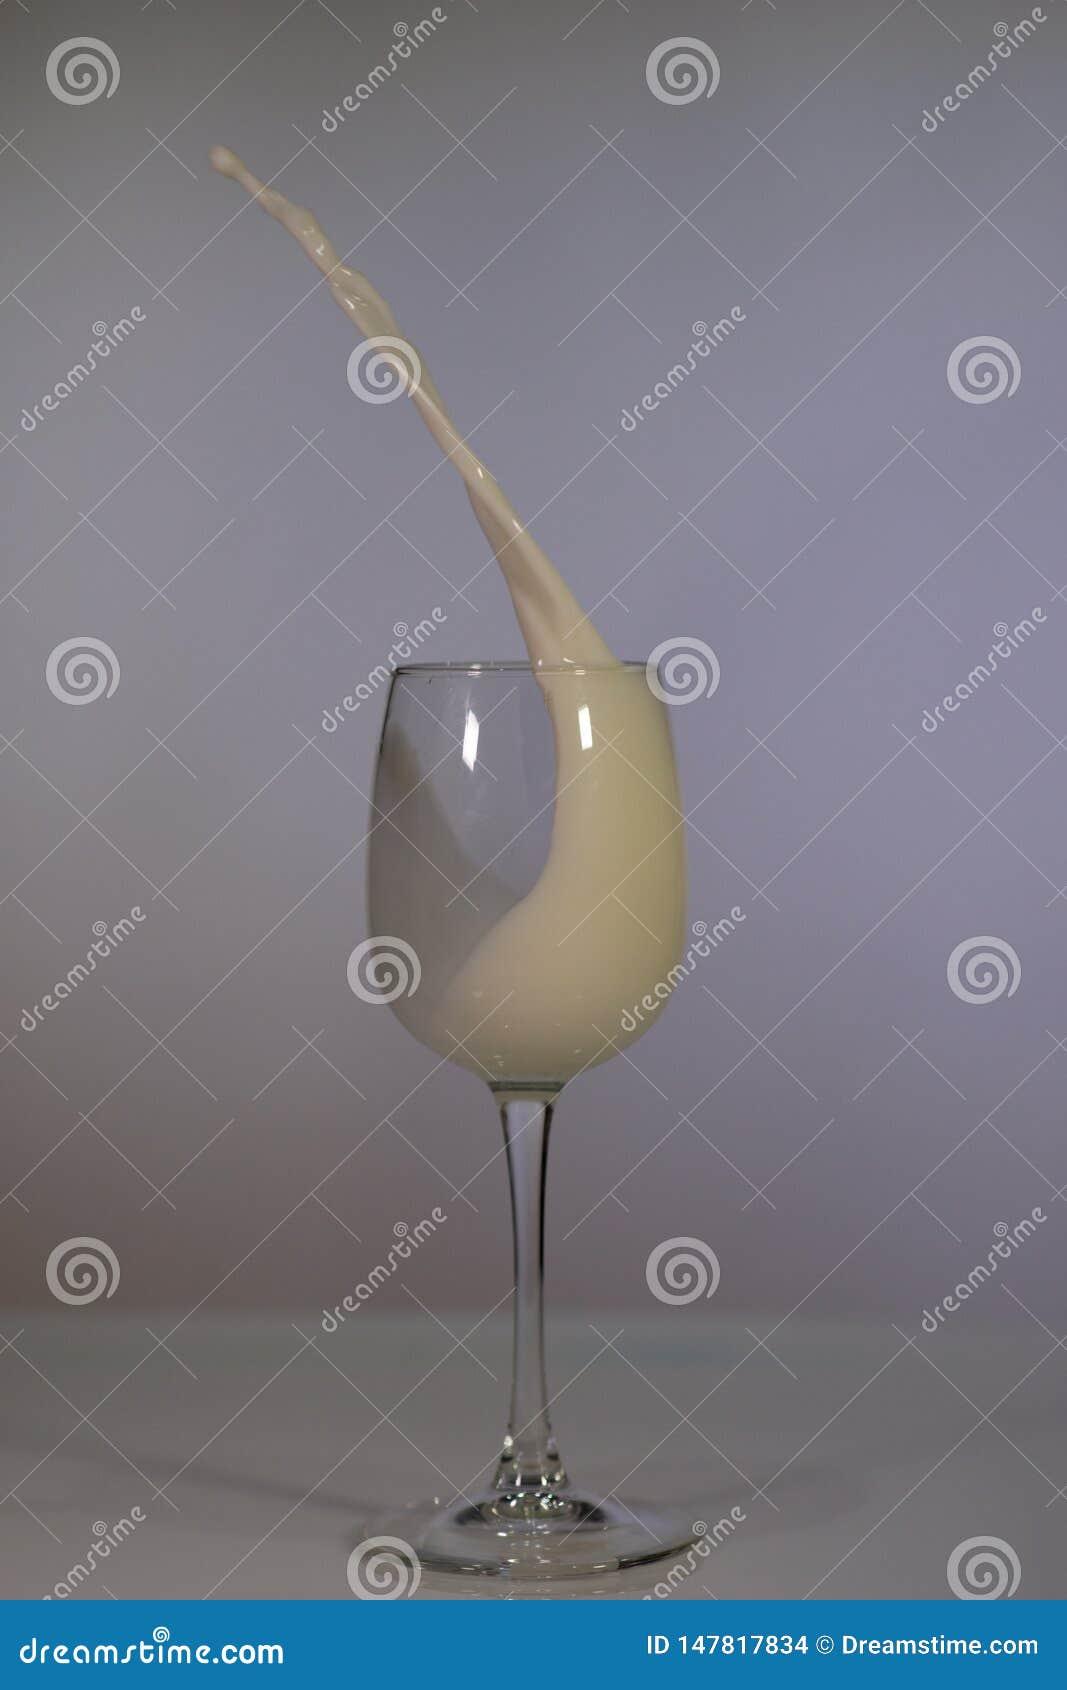 Glass of milk on a dark background. Spilled milk. Dairy produce.